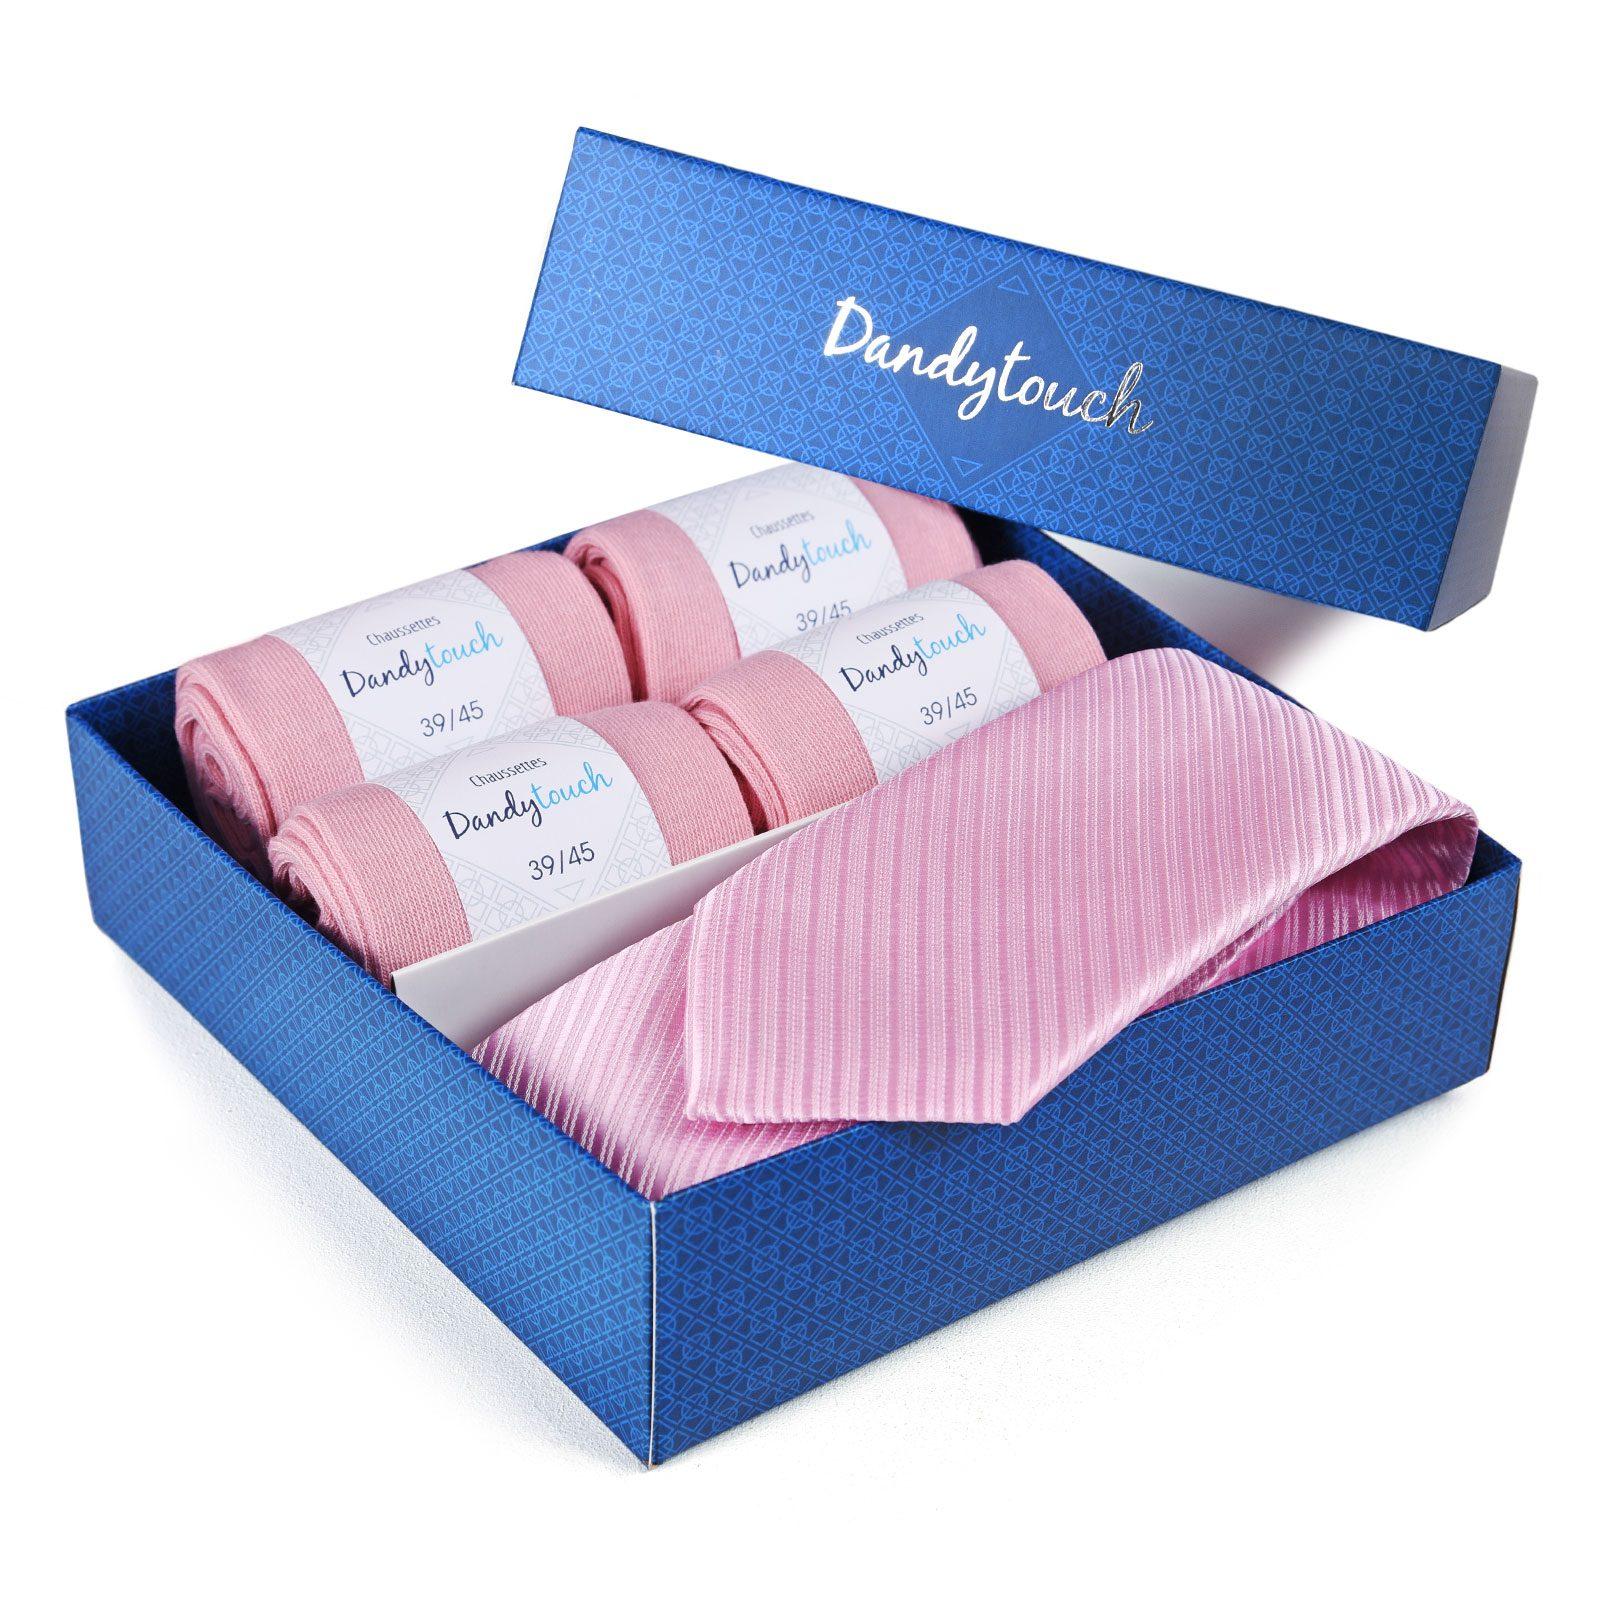 http://lookbook.allee-du-foulard.fr/wp-content/uploads/2018/12/PK-00087-B16-coffret-cadeau-chaussettes-cravate-rose-1600x1600.jpg